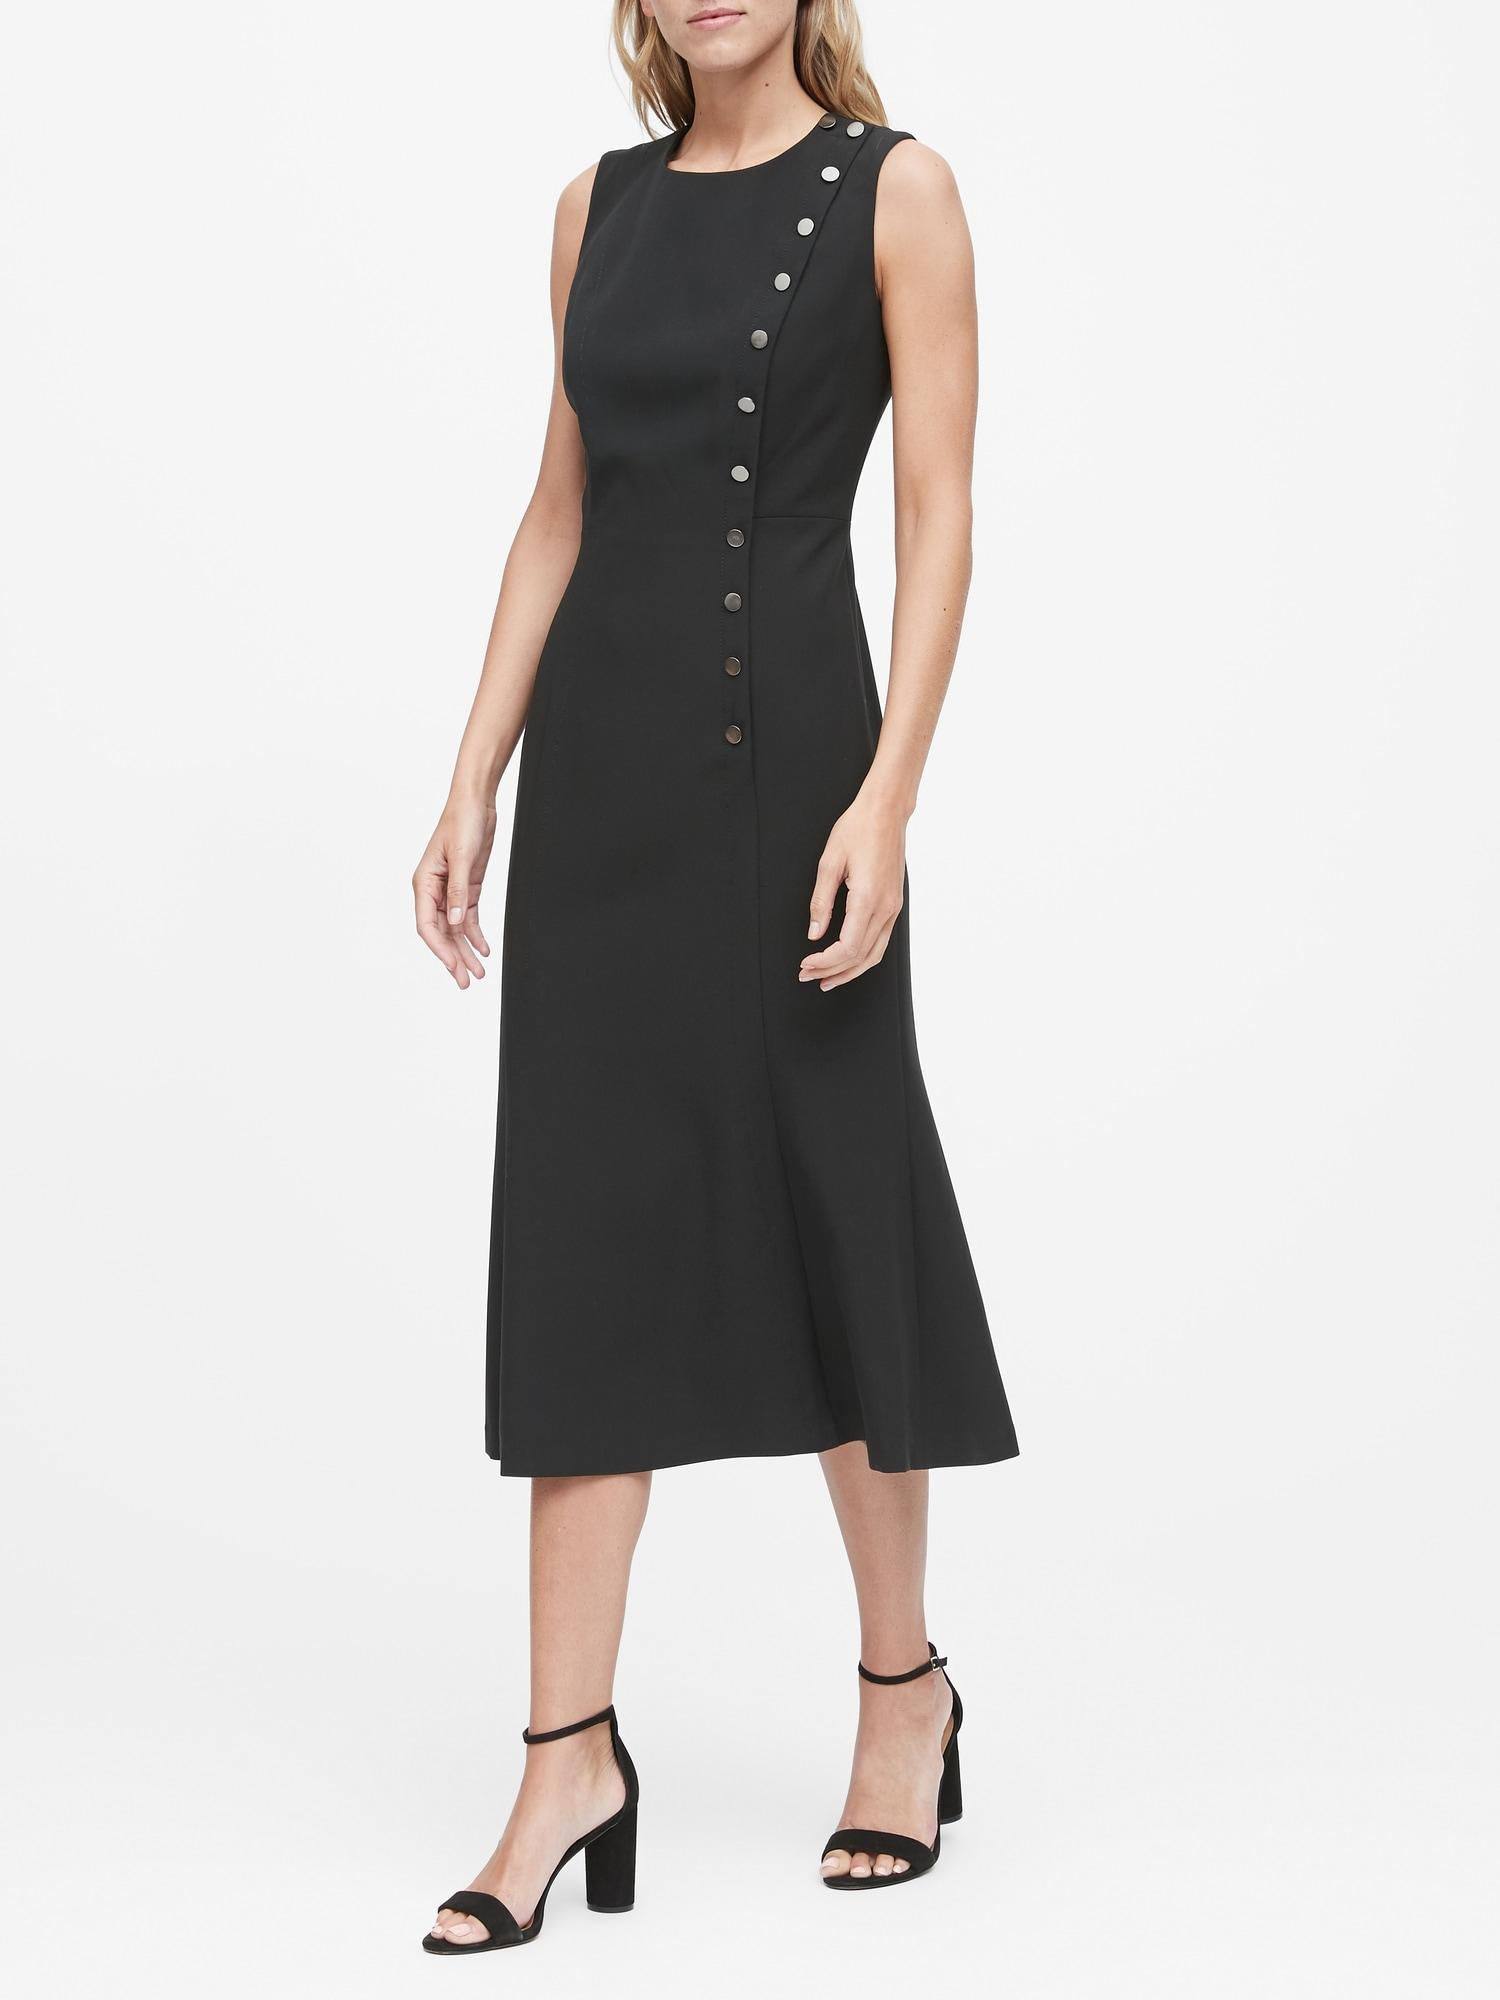 Banana Republic Petite Buttoned Midi Dress In Black Lyst